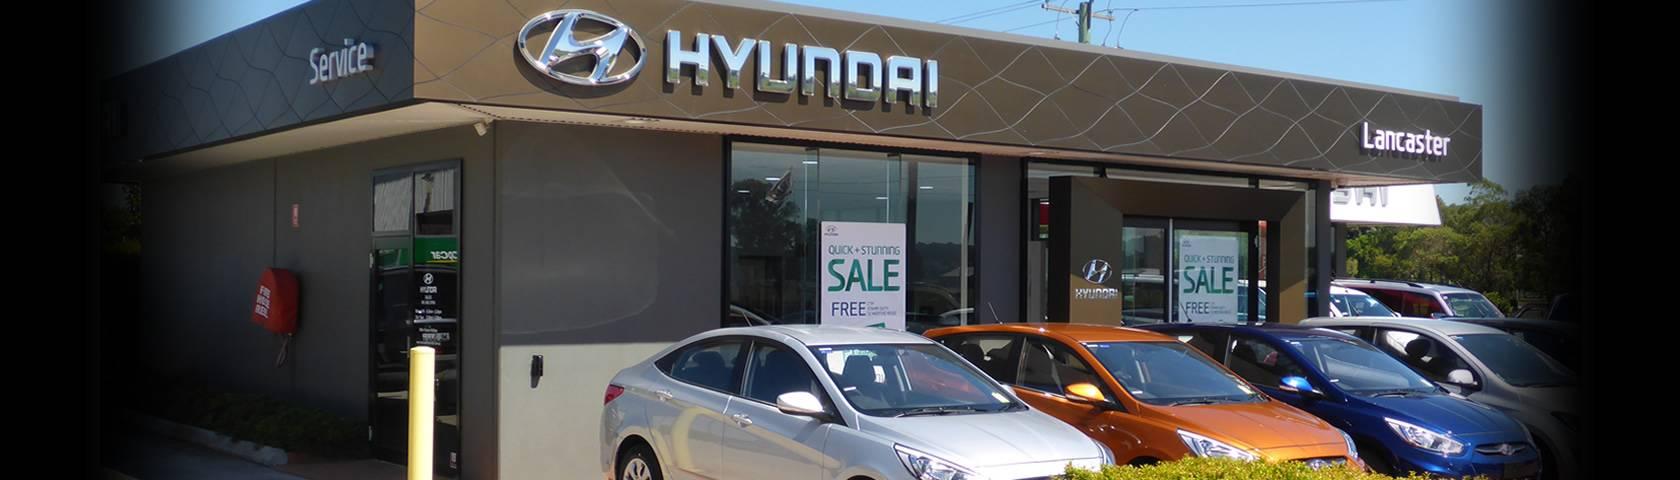 Lancaster Hyundai Service Centre